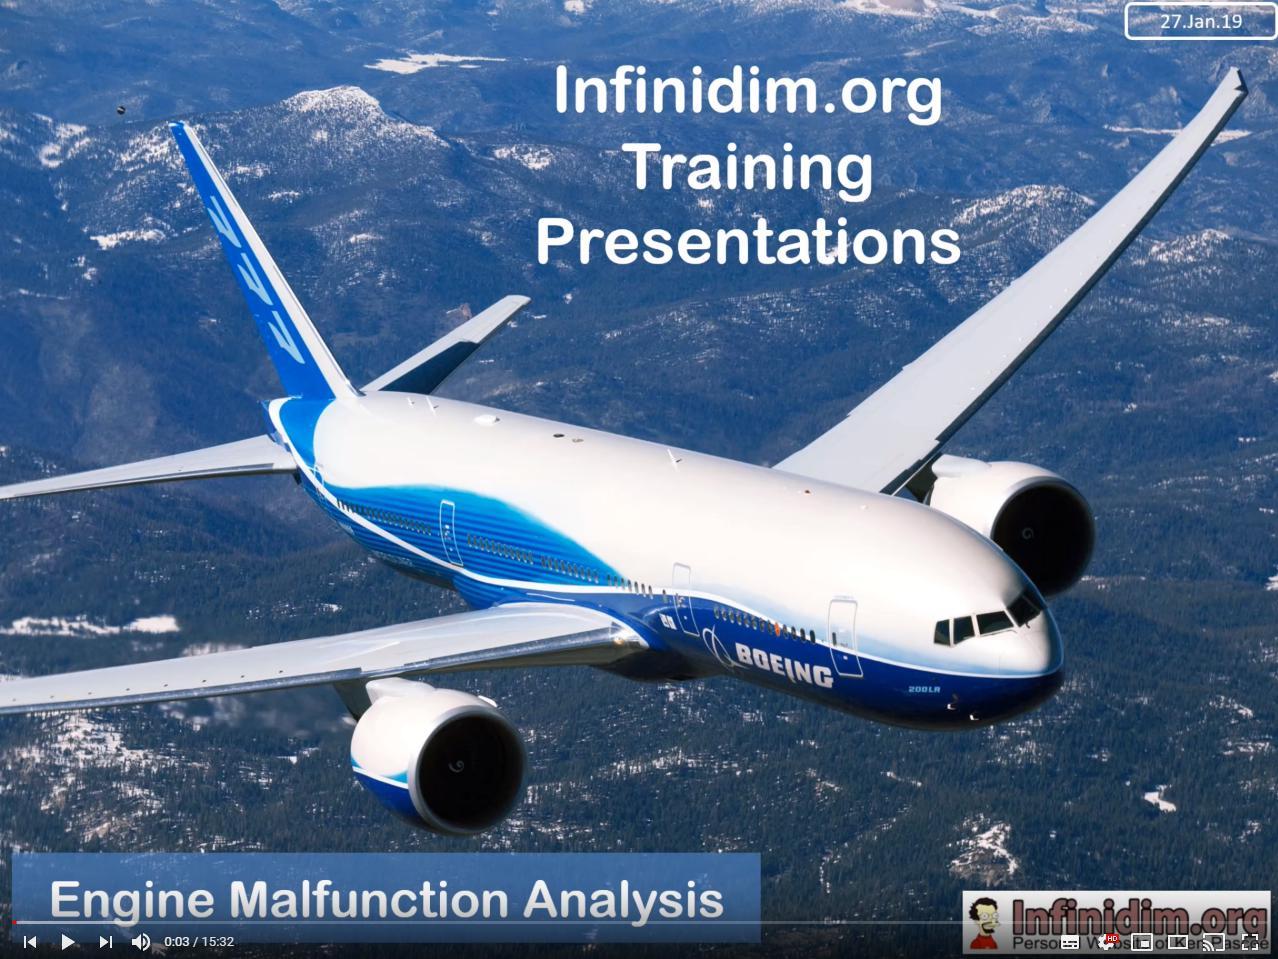 Infinidim Training Videos